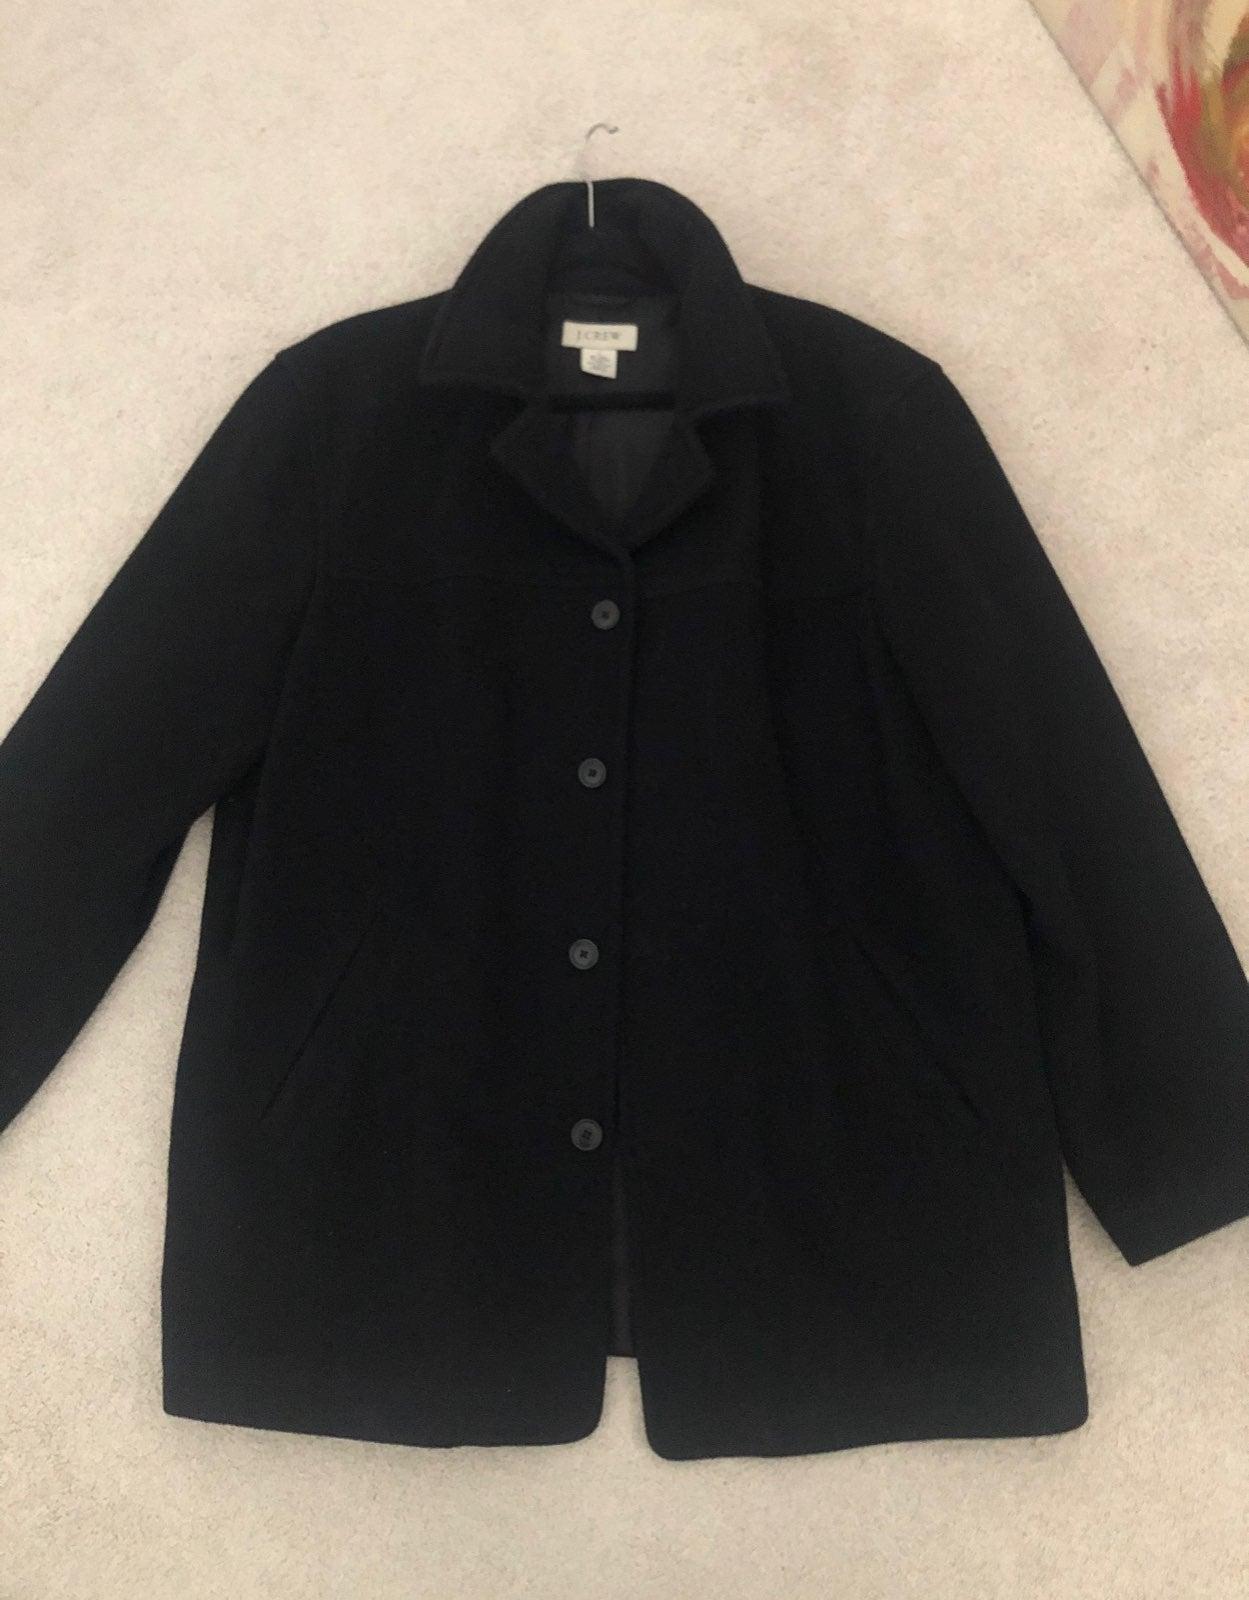 J.Crew mens jacket